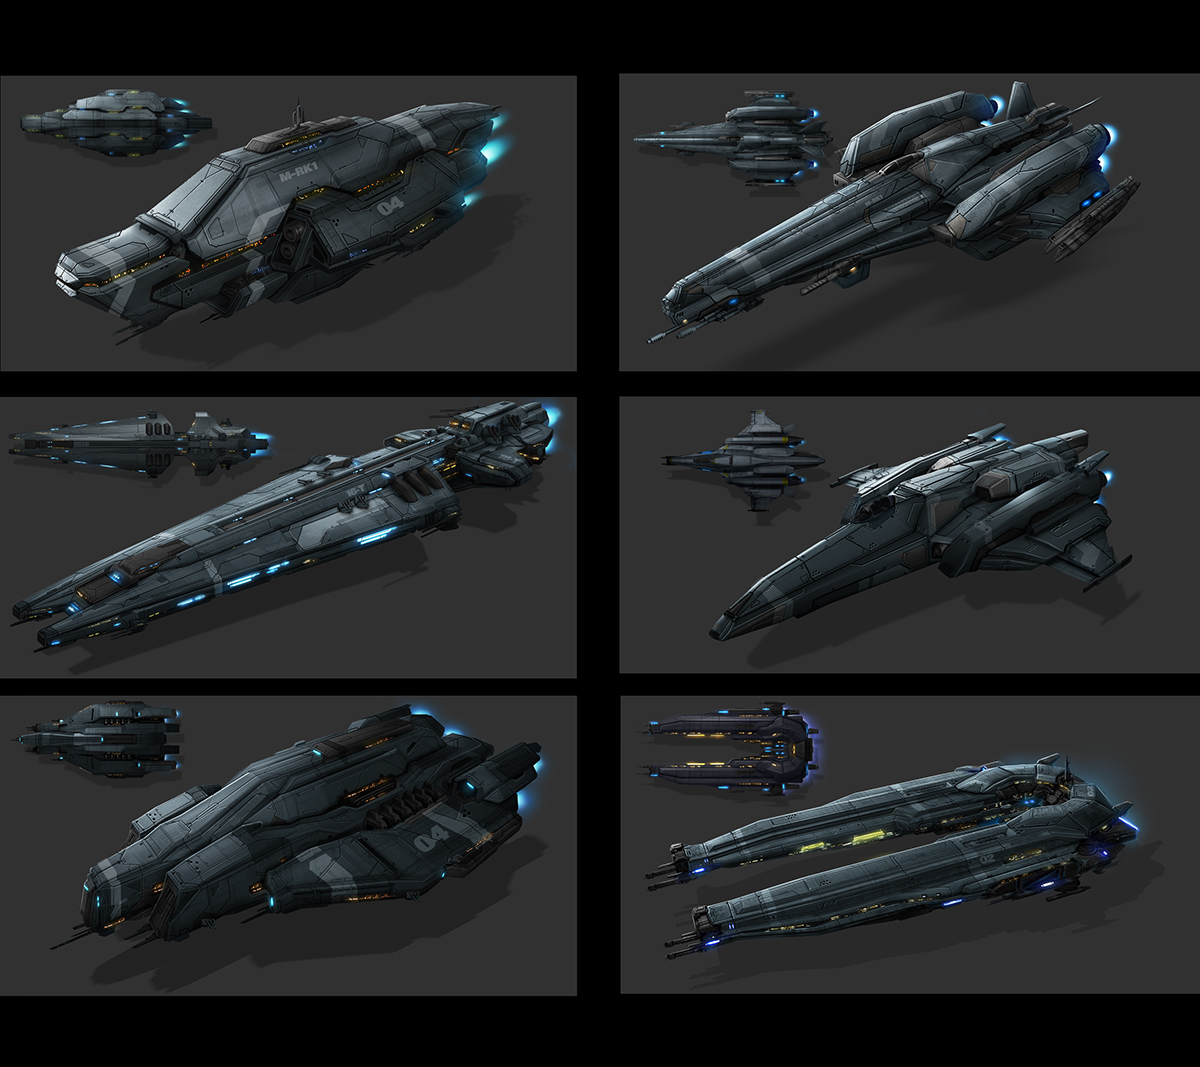 mechdesign conceptart conceptdesign mecha robots vehicles science fiction